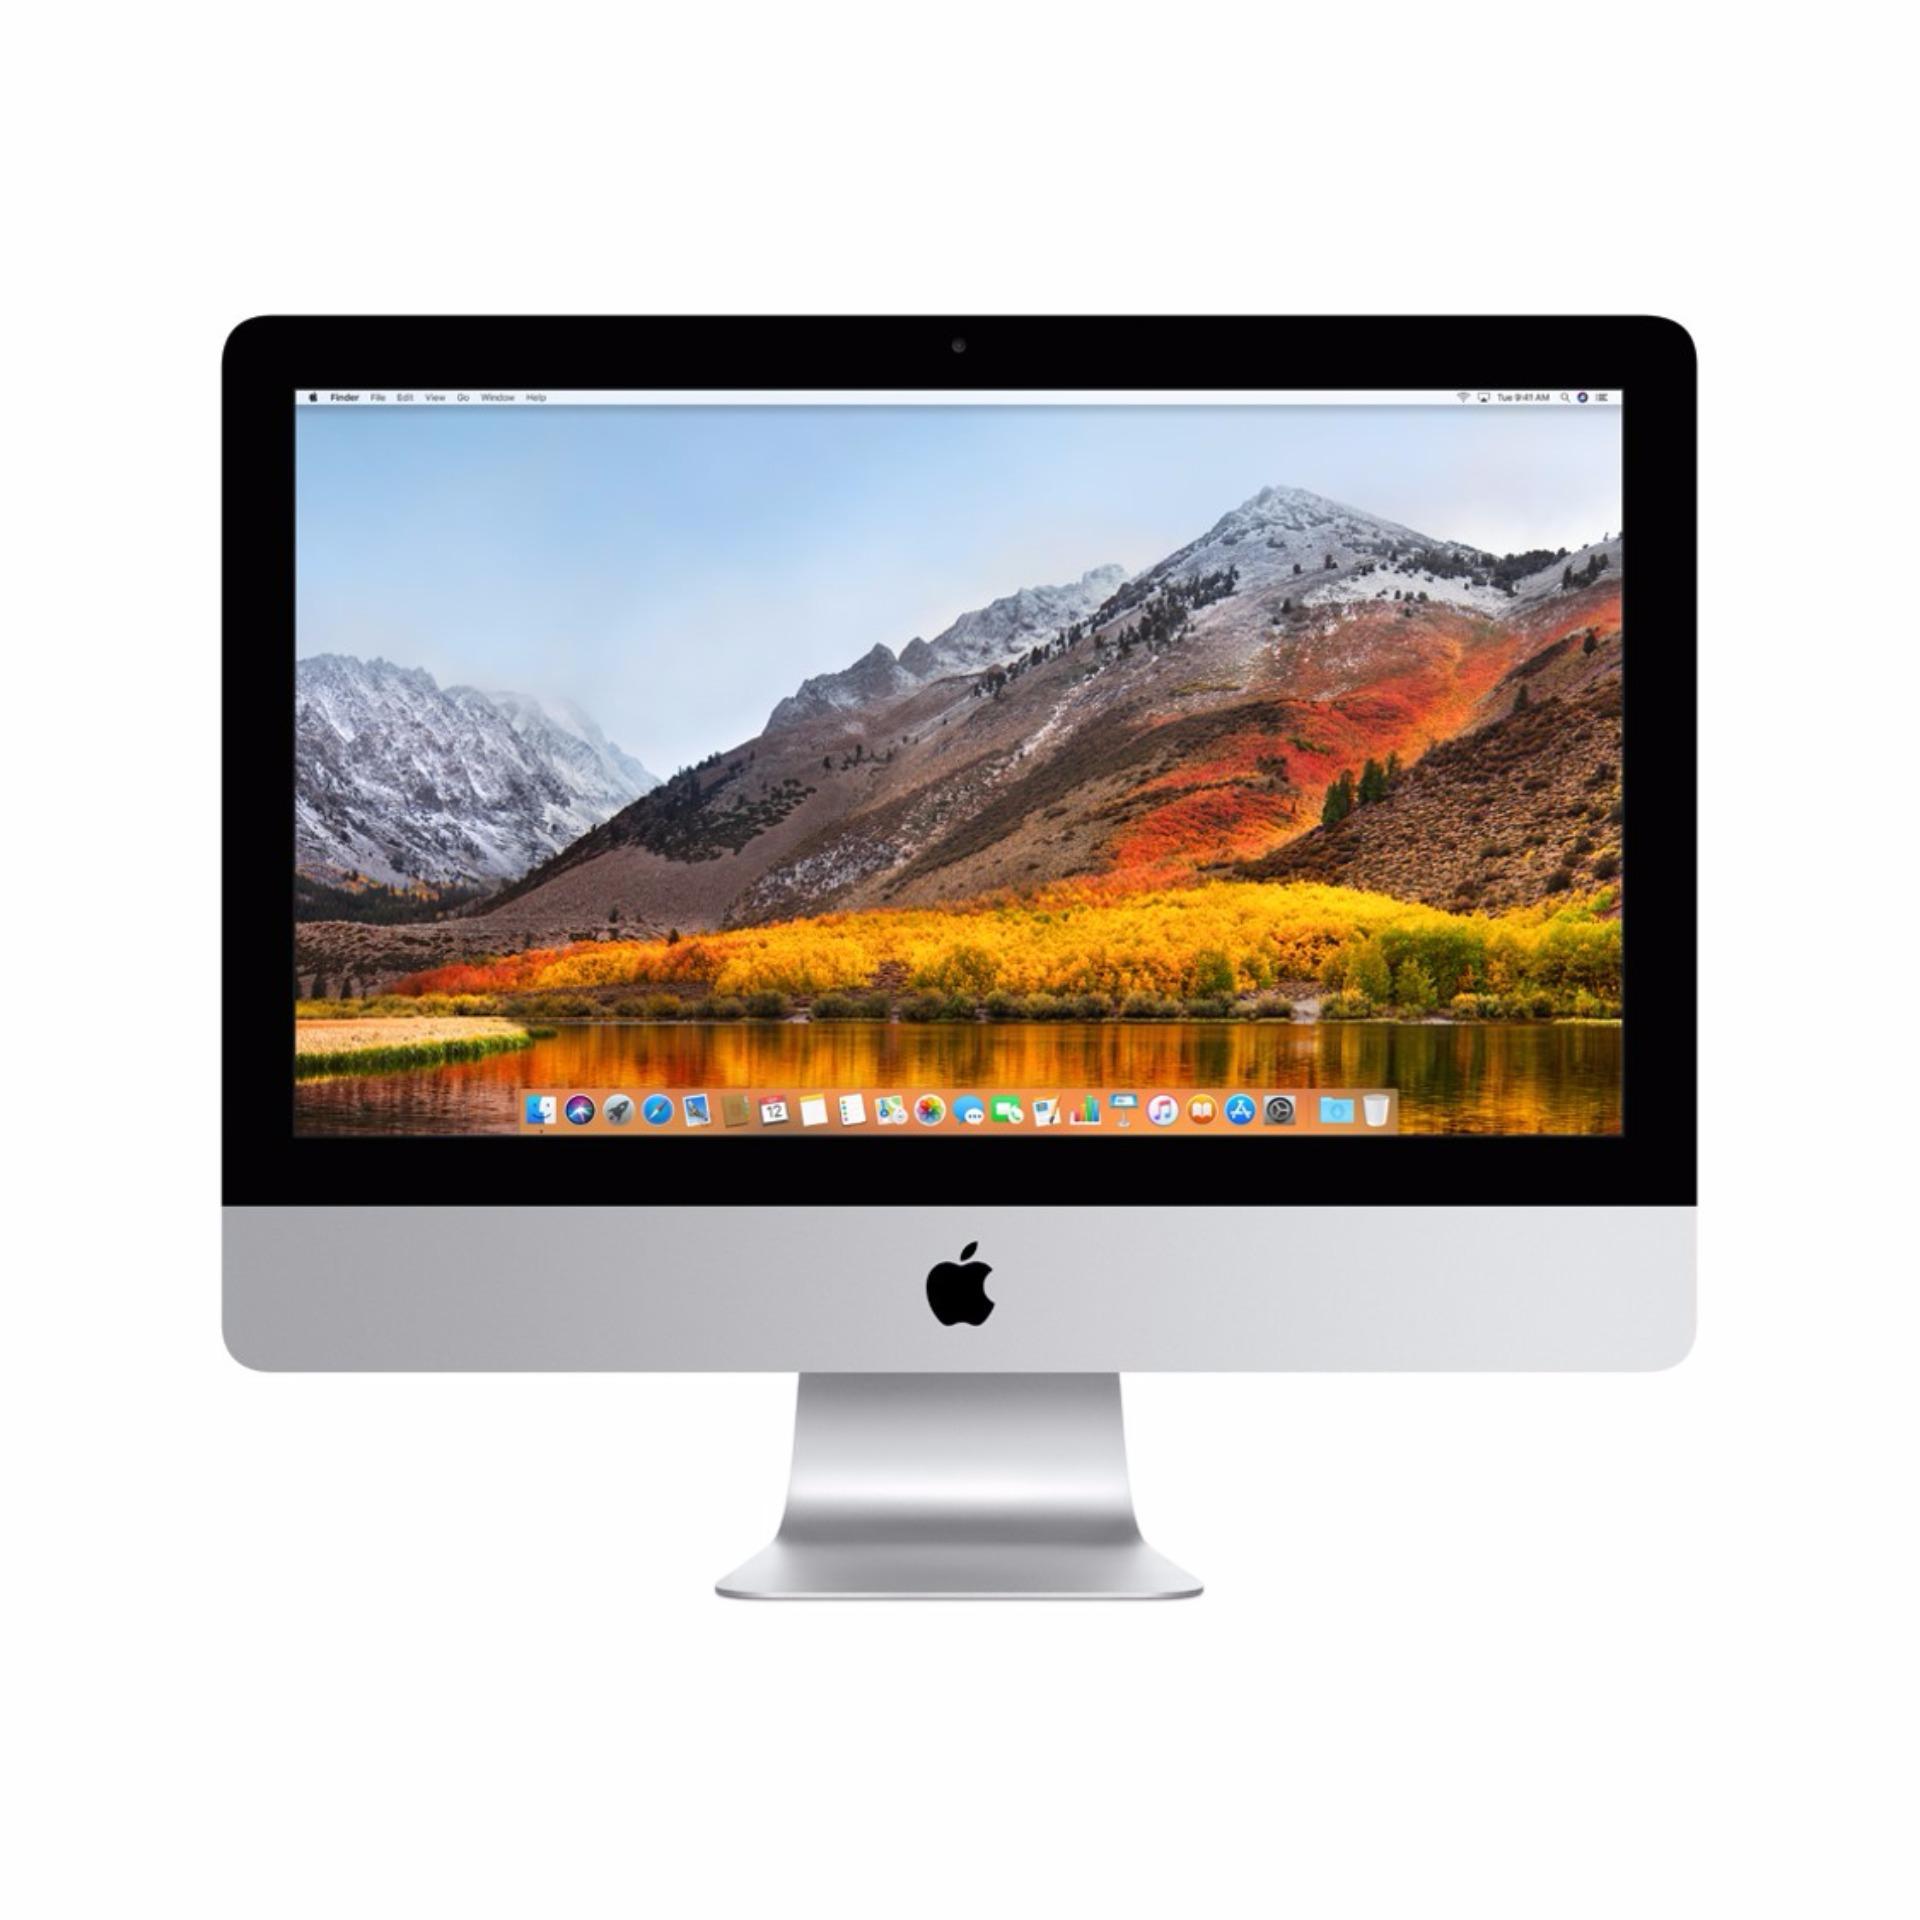 Apple iMac 21.5-inch with Retina 4K display: 3.4GHz quad-core Intel Core i5